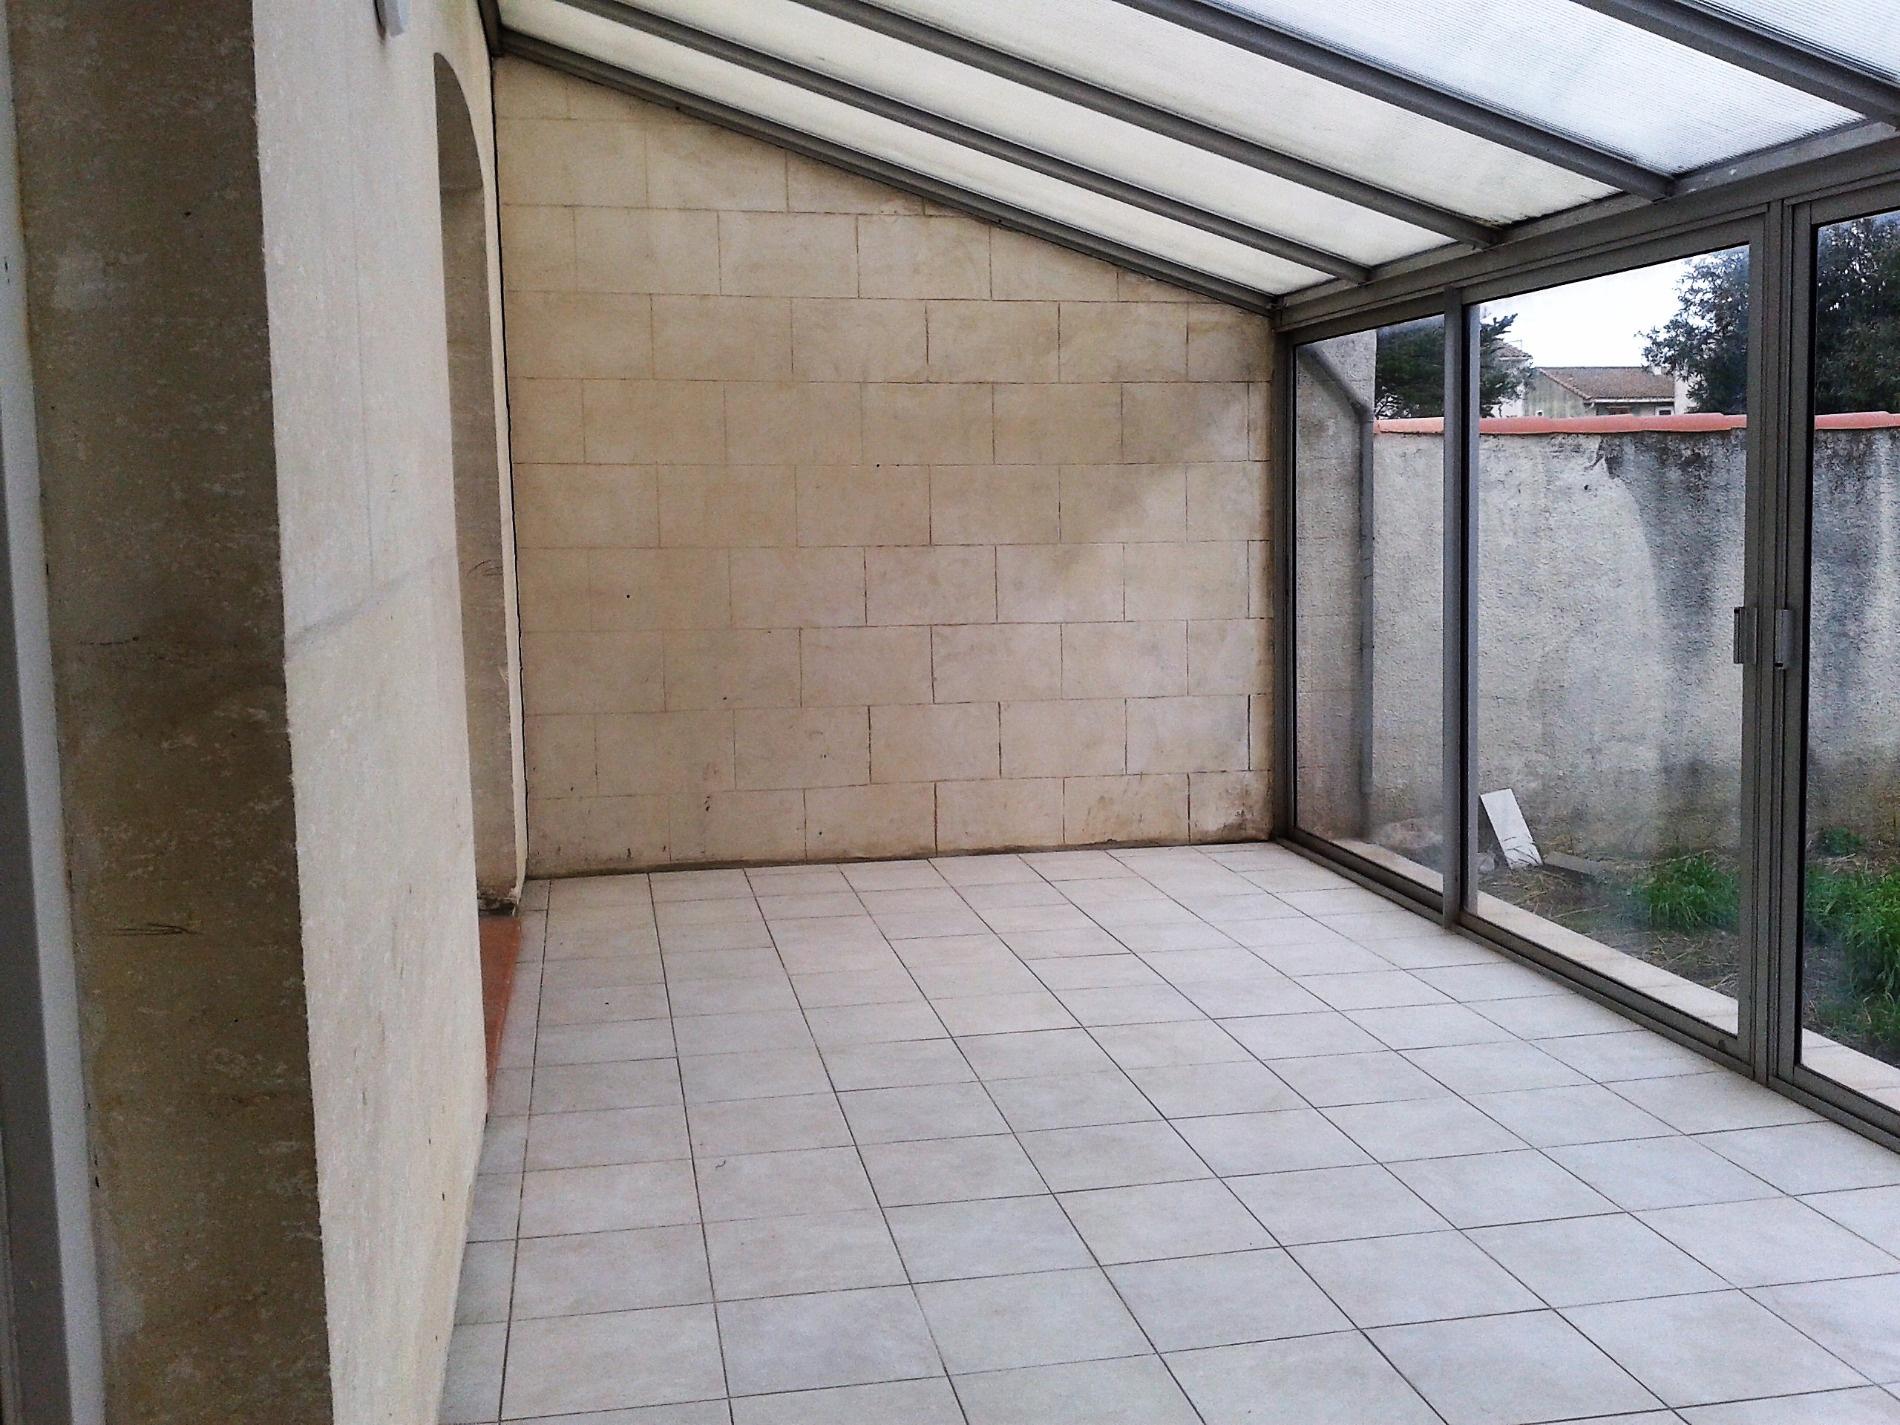 Location lotissement calme maison r nov e t4 avec jardin for Location garage 77